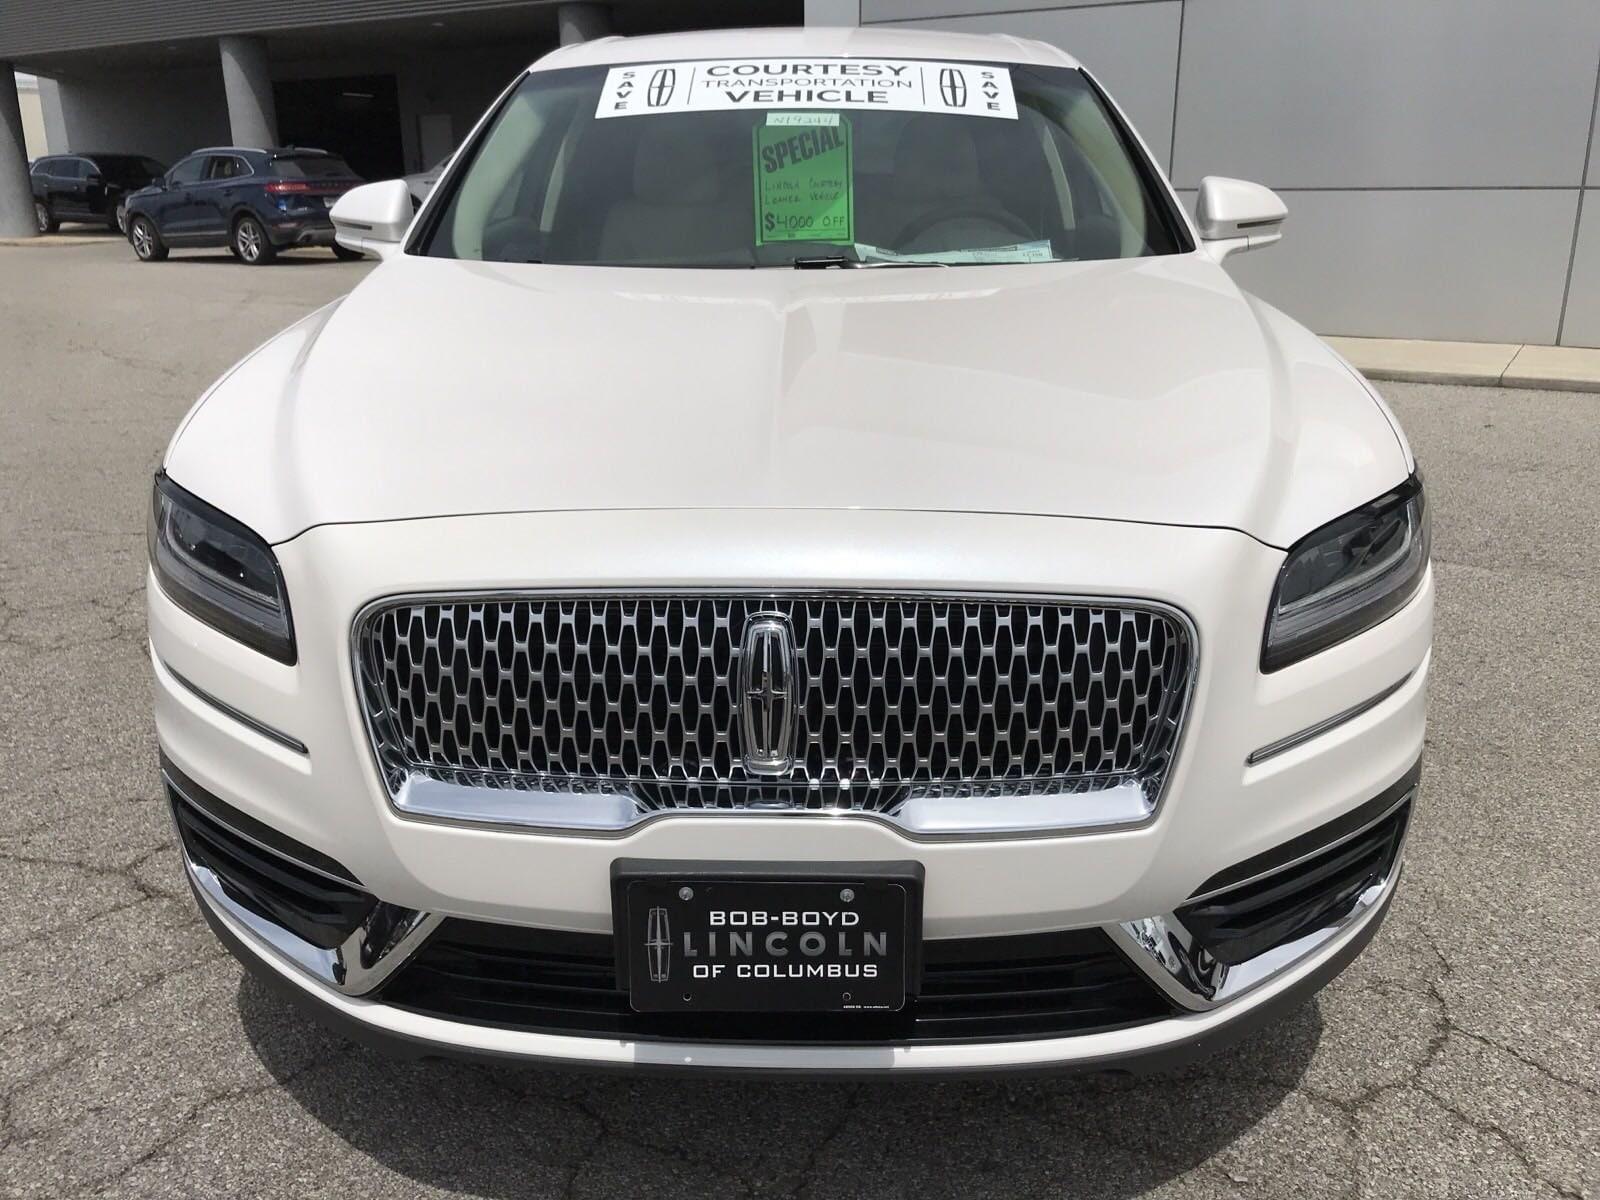 New 2019 Lincoln Nautilus For Sale at Bob-Boyd Auto Family